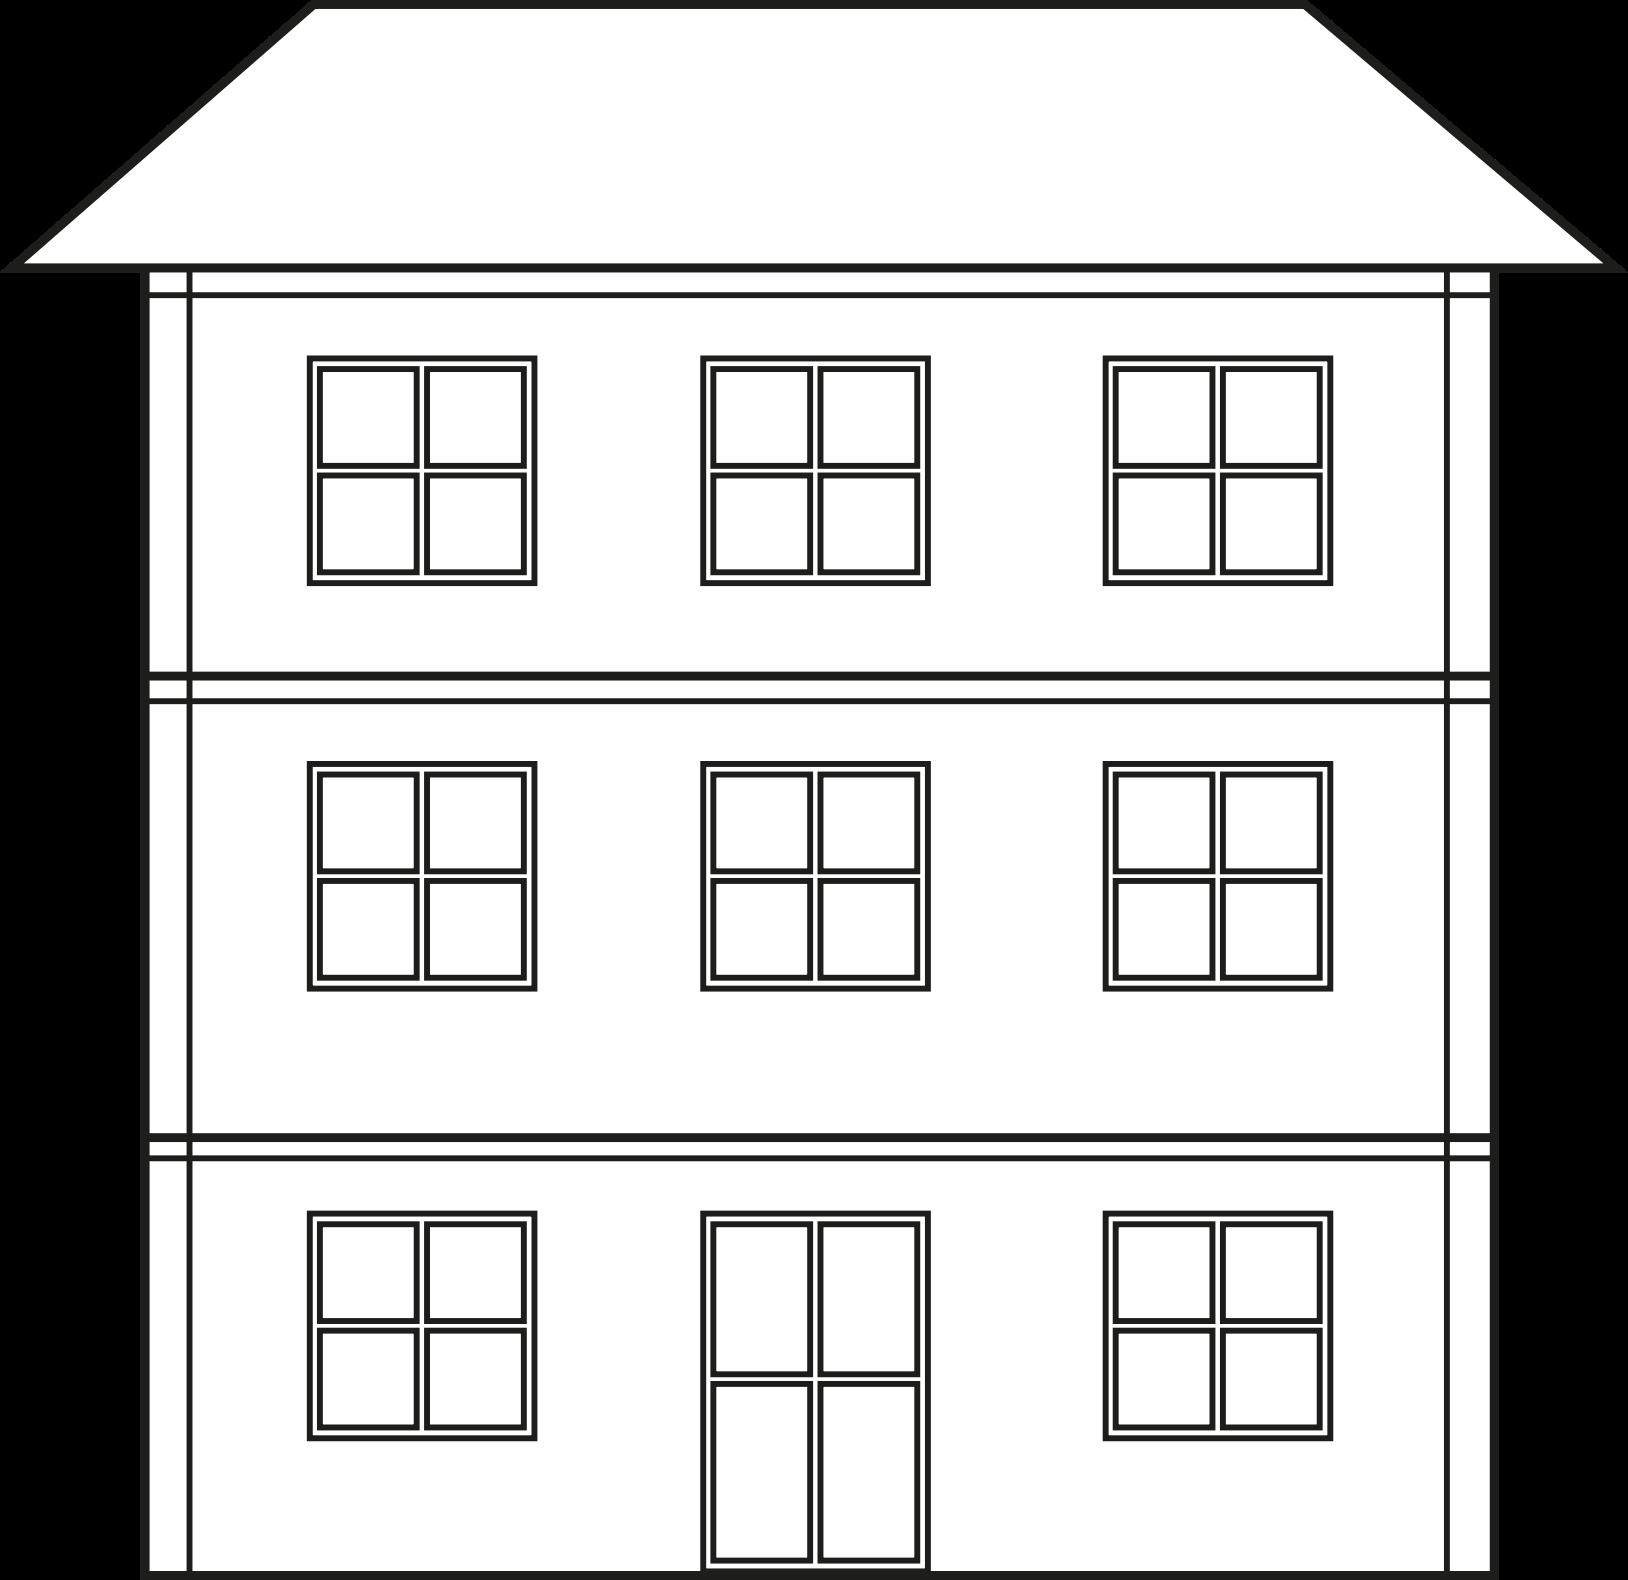 Doll house big image. Houses clipart jpeg